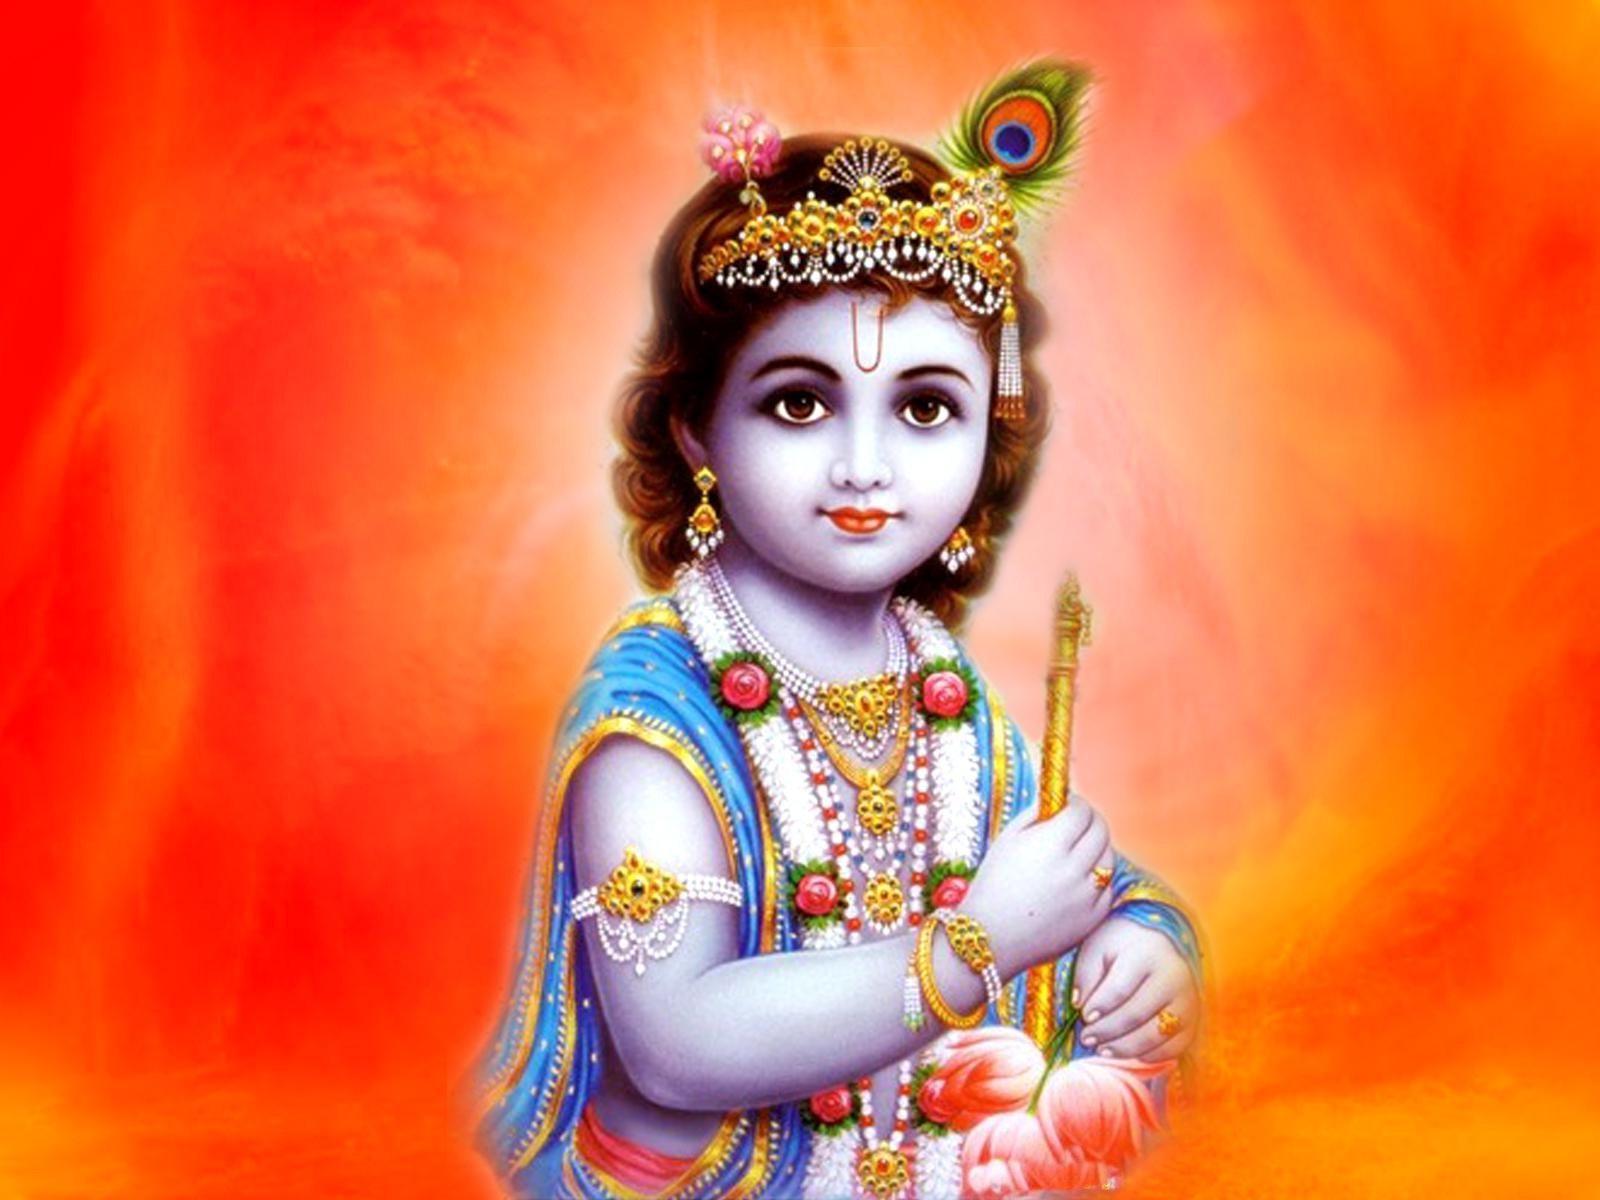 cute-bal-krishna-full--wide-hd-wallpapers